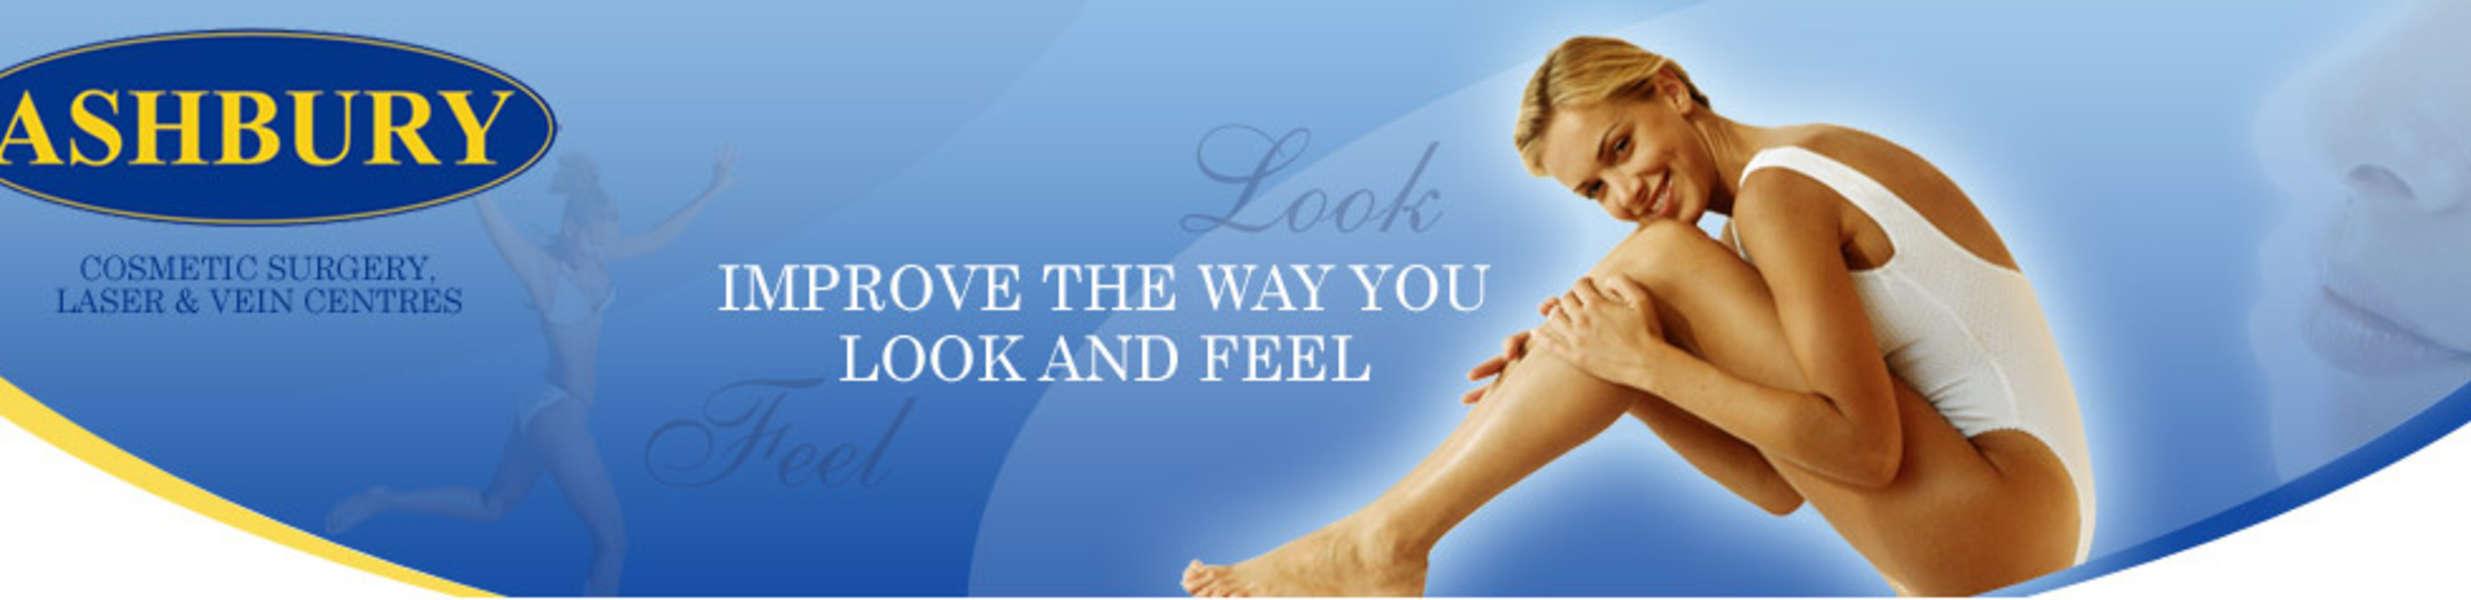 Ashbury Cosmetic Surgery Indooroopilly